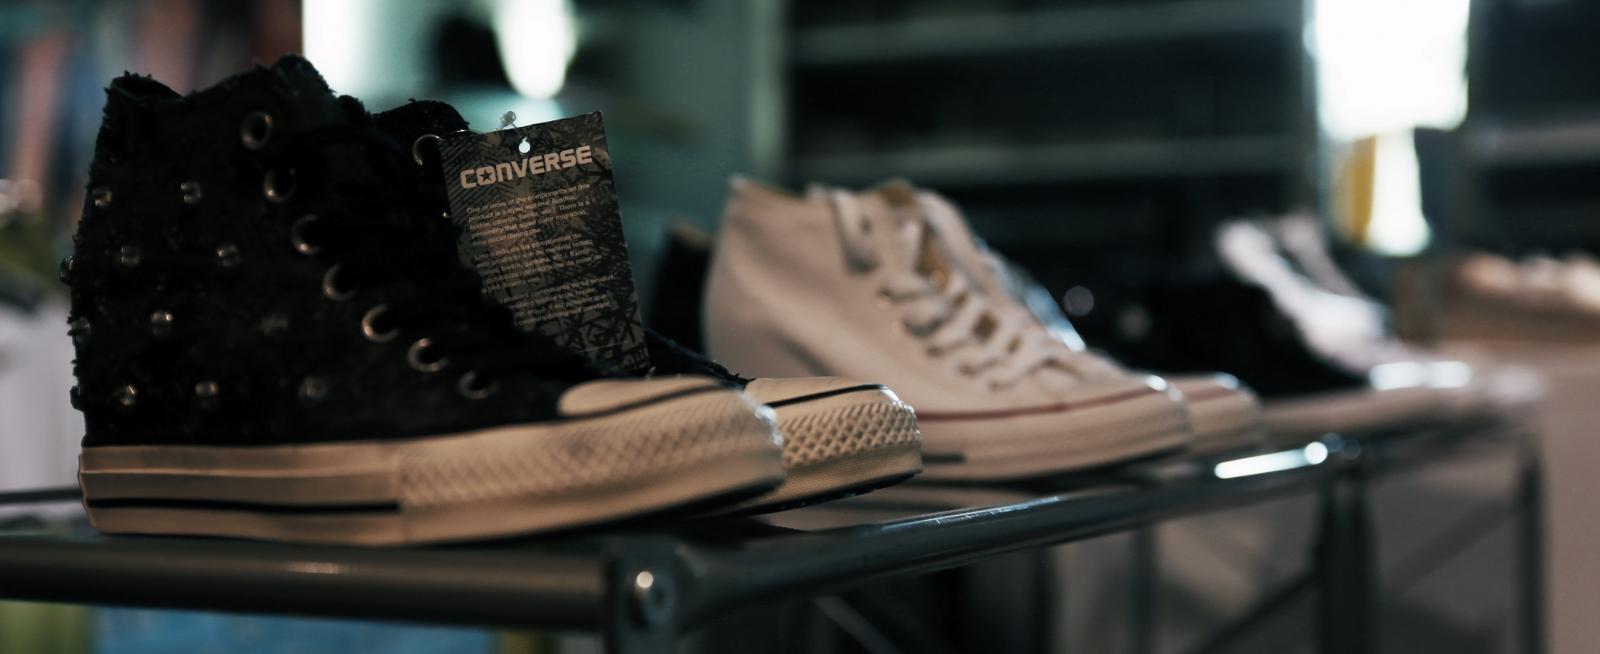 6a16fb48a25 I nostri brands - Sportmaster fashion